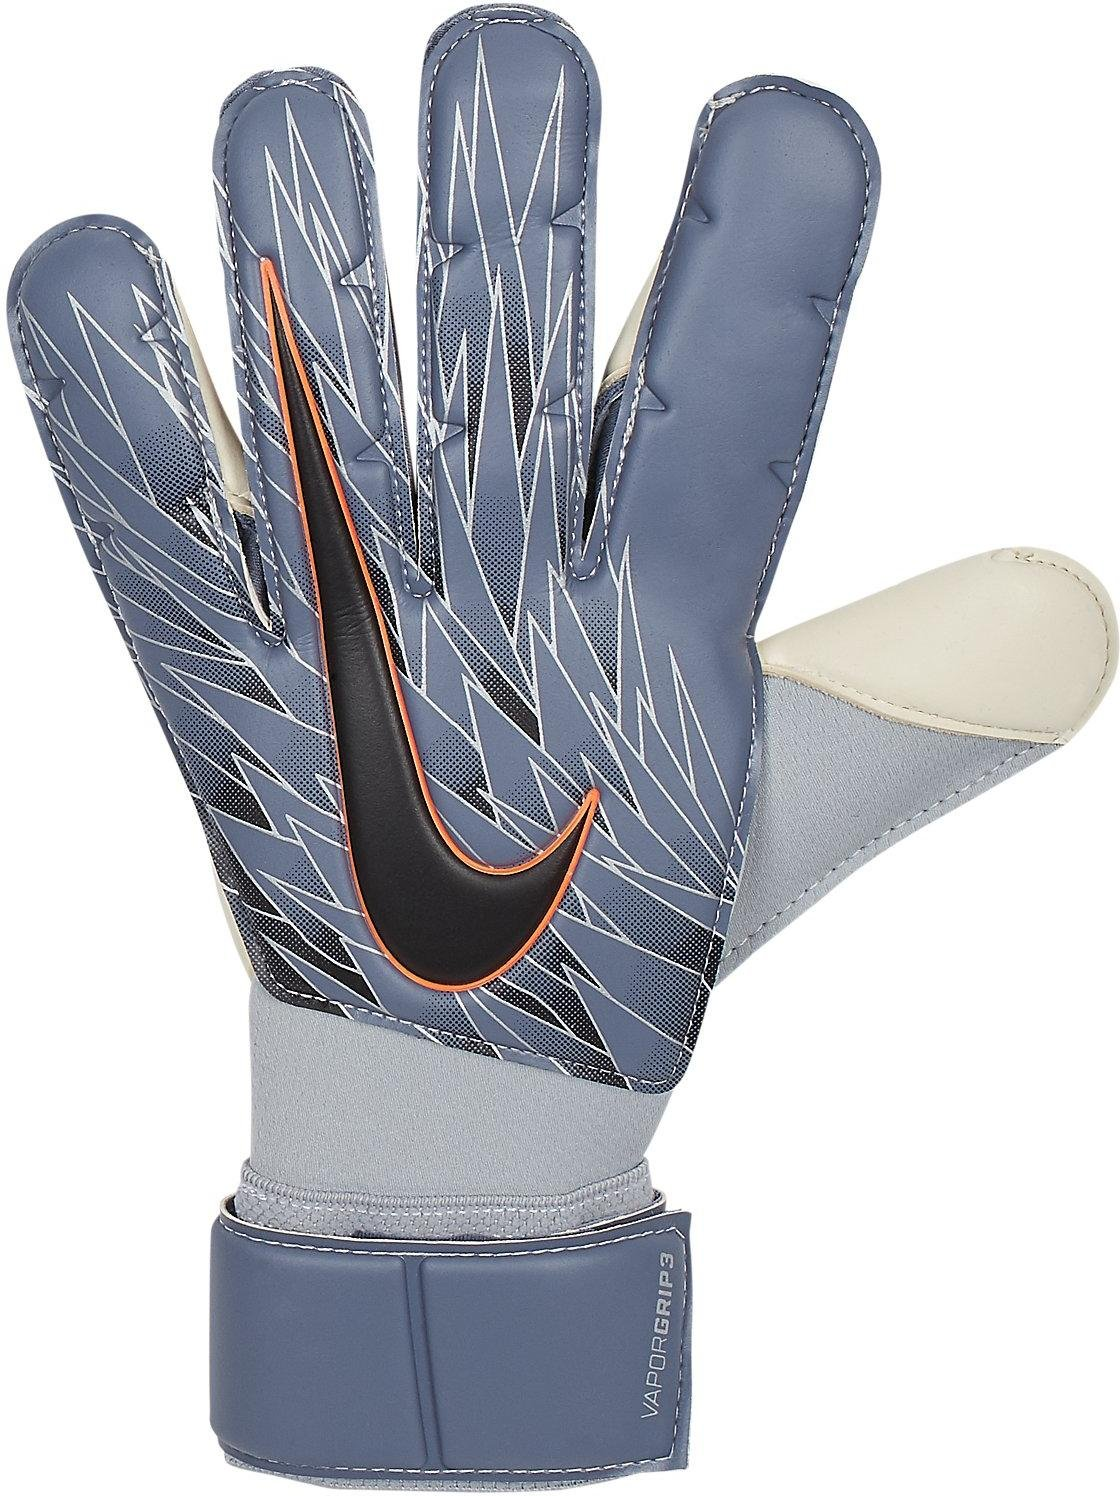 Calibre periscopio Sierra  Brankářské rukavice Nike Goalkeeper Vapor Grip3